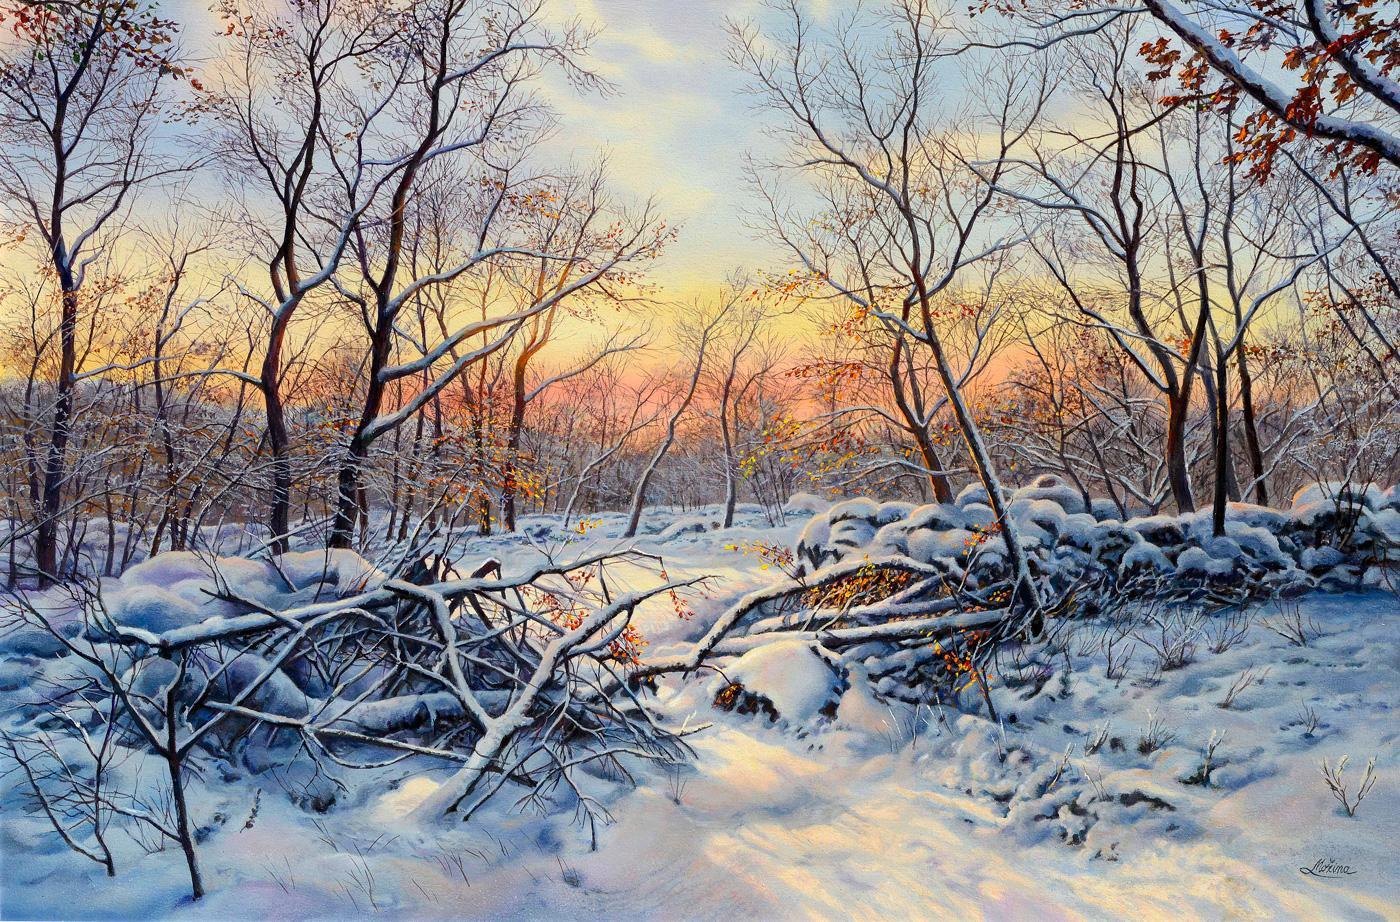 Livio-Mozina - Tramonto con neve